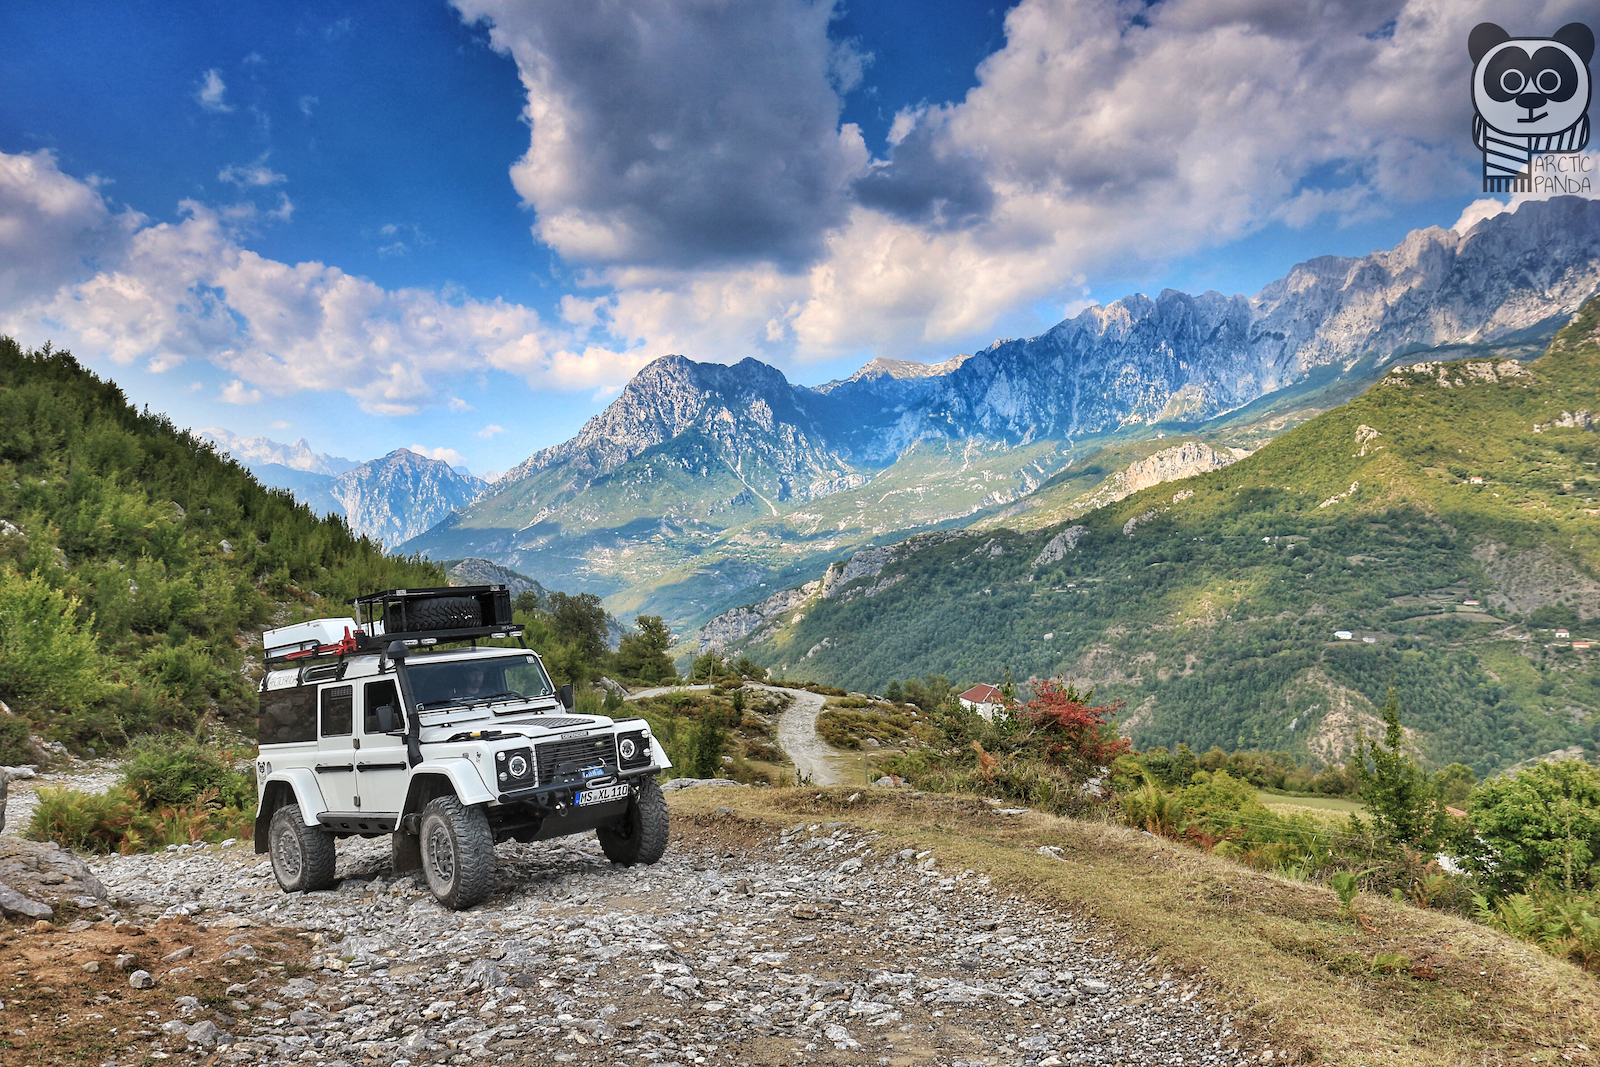 Blick in die Pandaaugen....unterwegs in den albanischen Bergen.